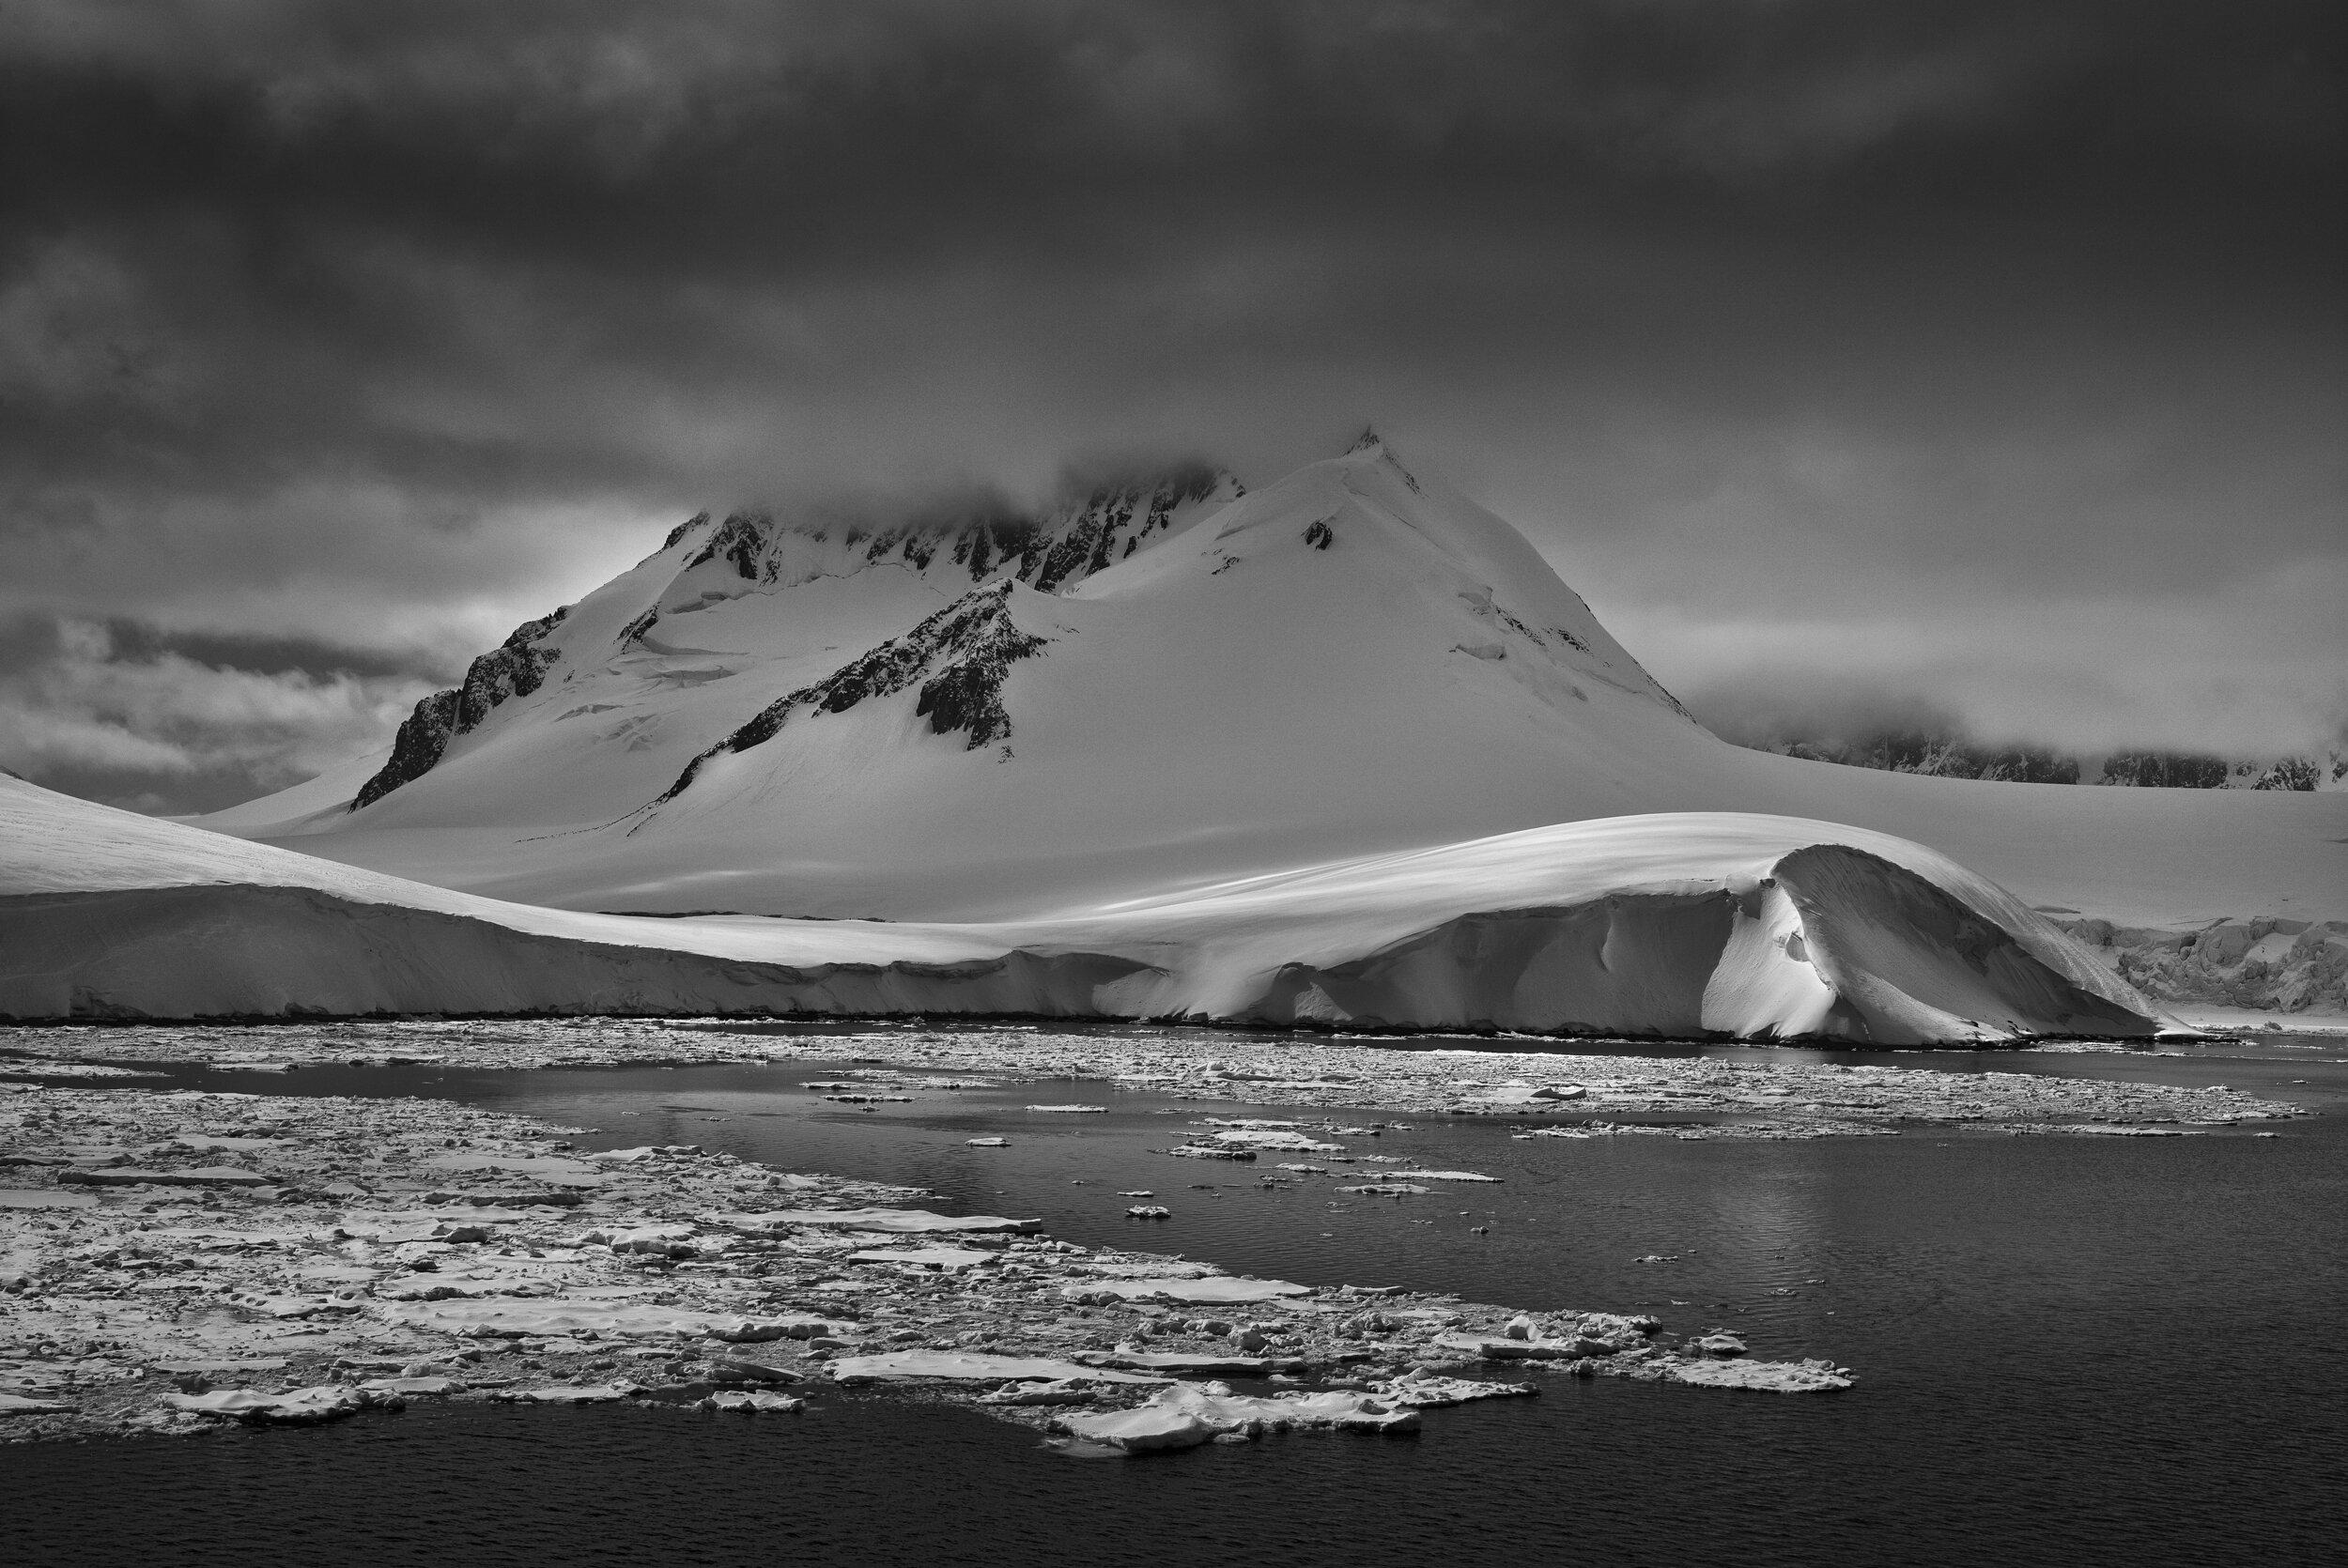 manuel_uebler_antarctica_bw_018.jpg